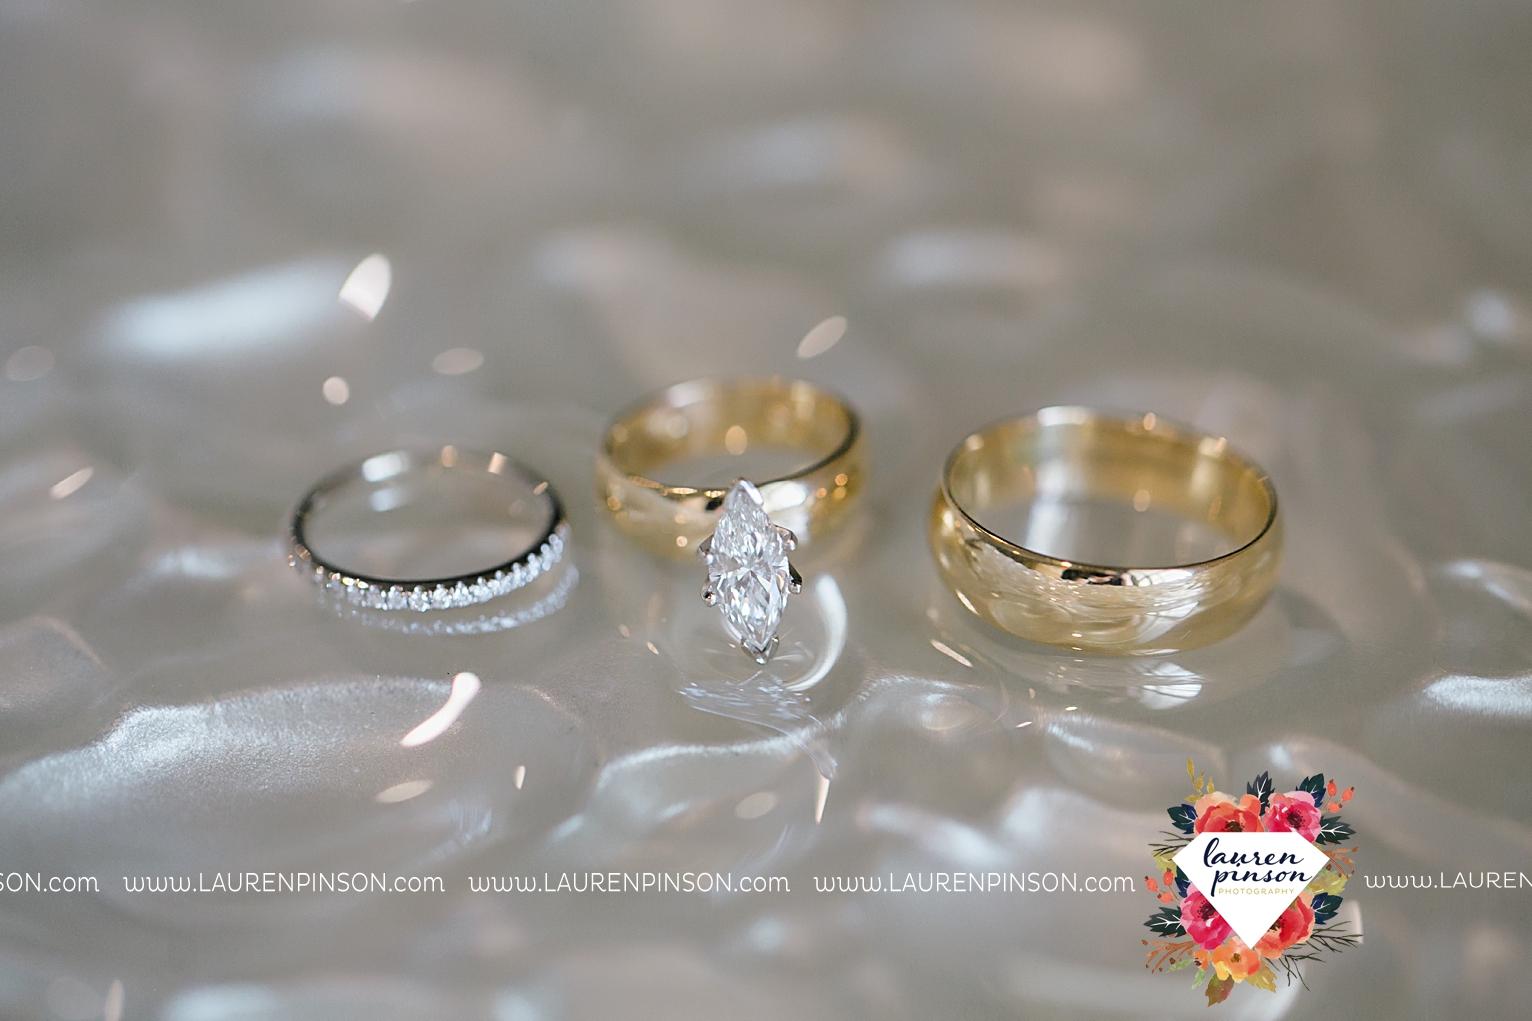 wichita-falls-texas-wedding-photographer-the-forum-by-the-kemp-mayfield-events-ulta-gold-glitter_2806.jpg